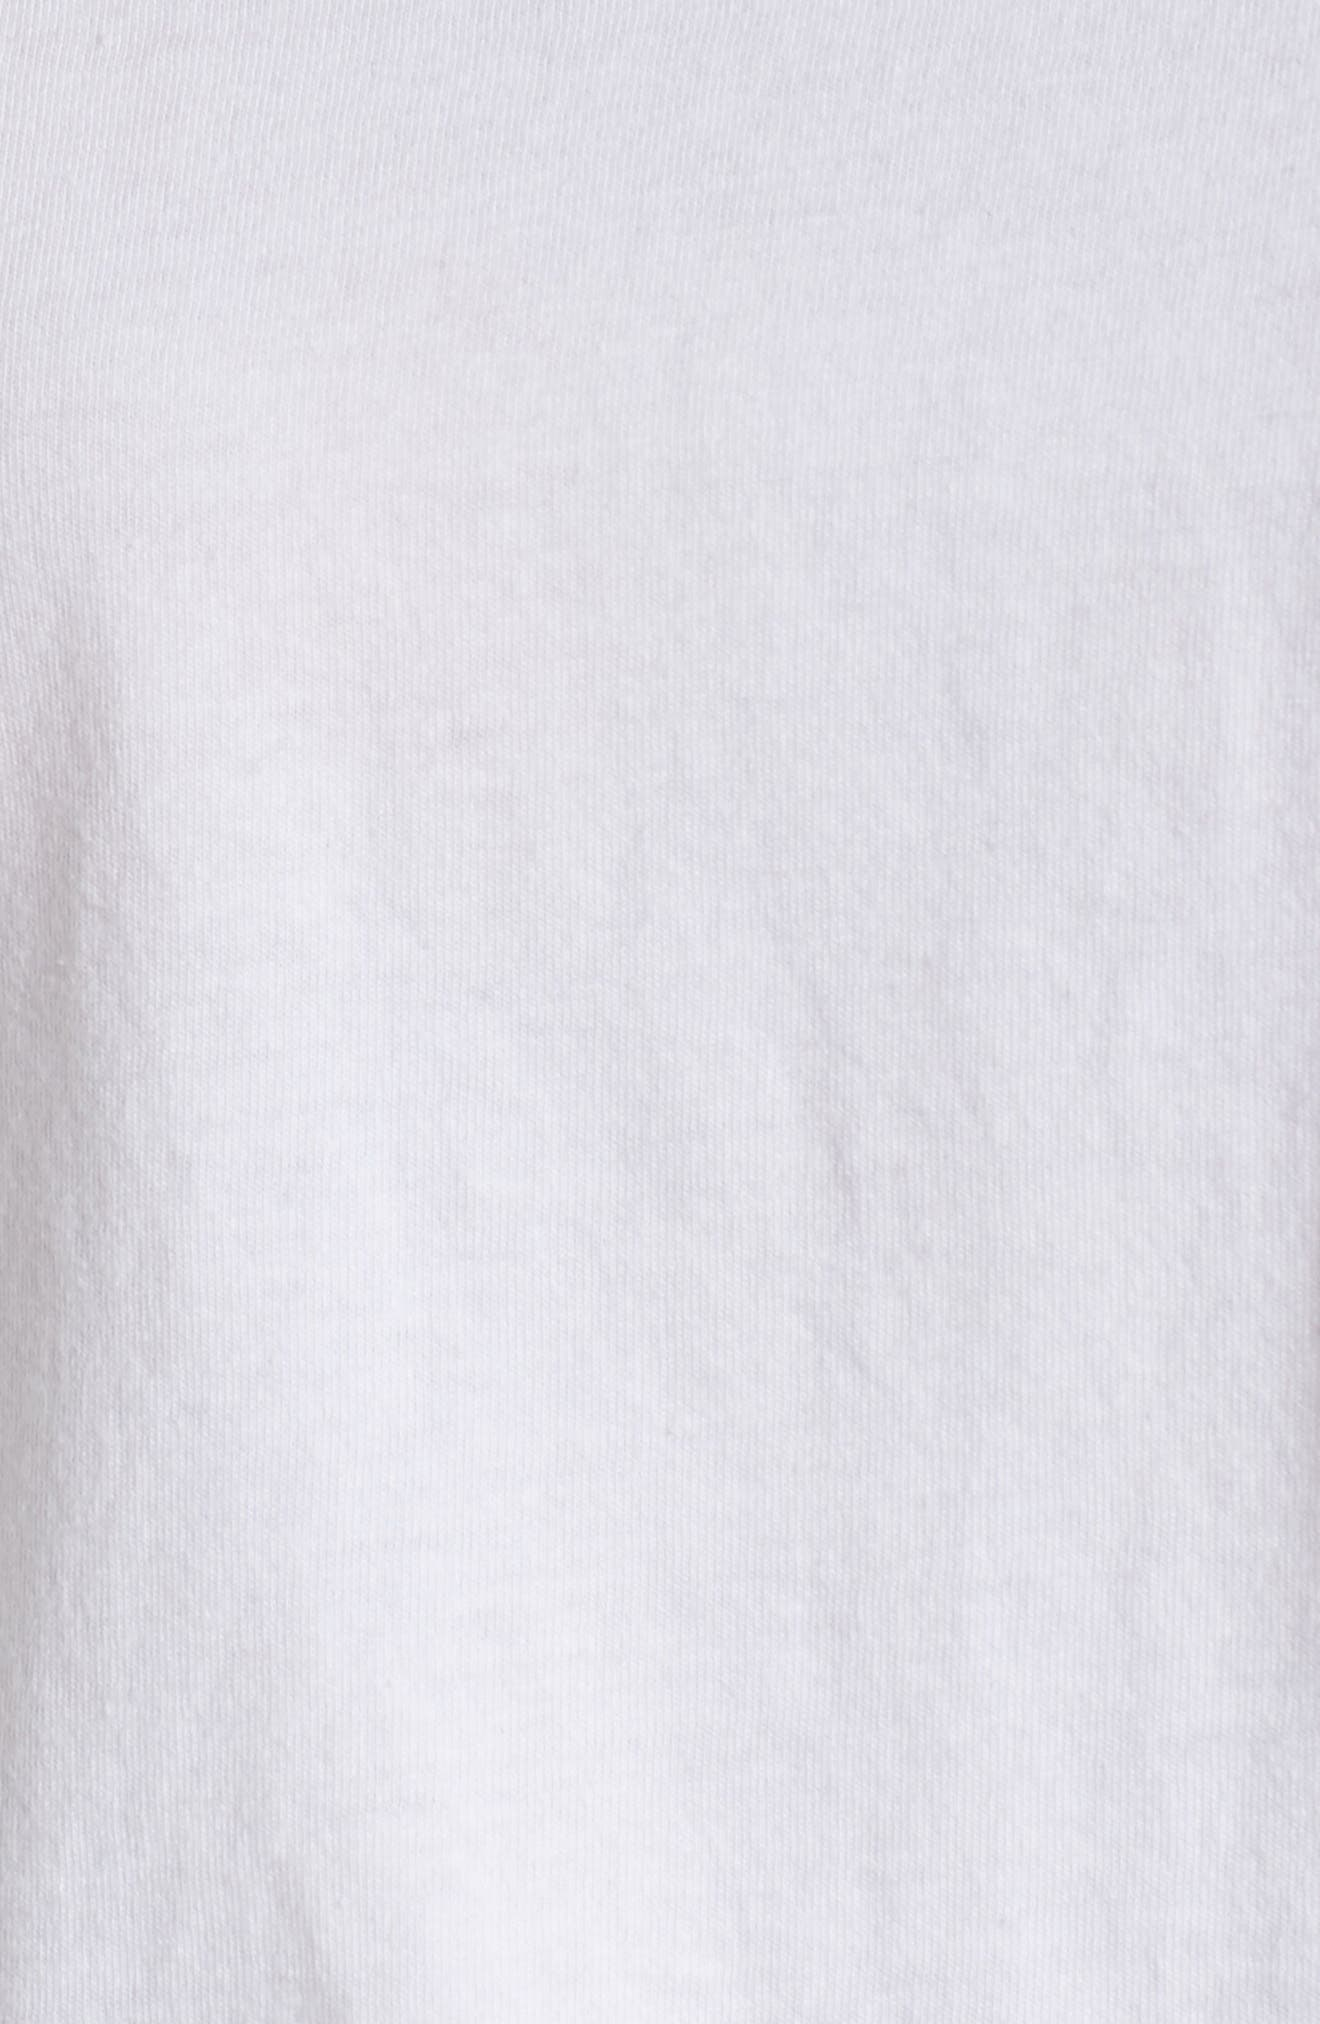 Long Sleeve Pocket Tee,                             Alternate thumbnail 5, color,                             WHITE